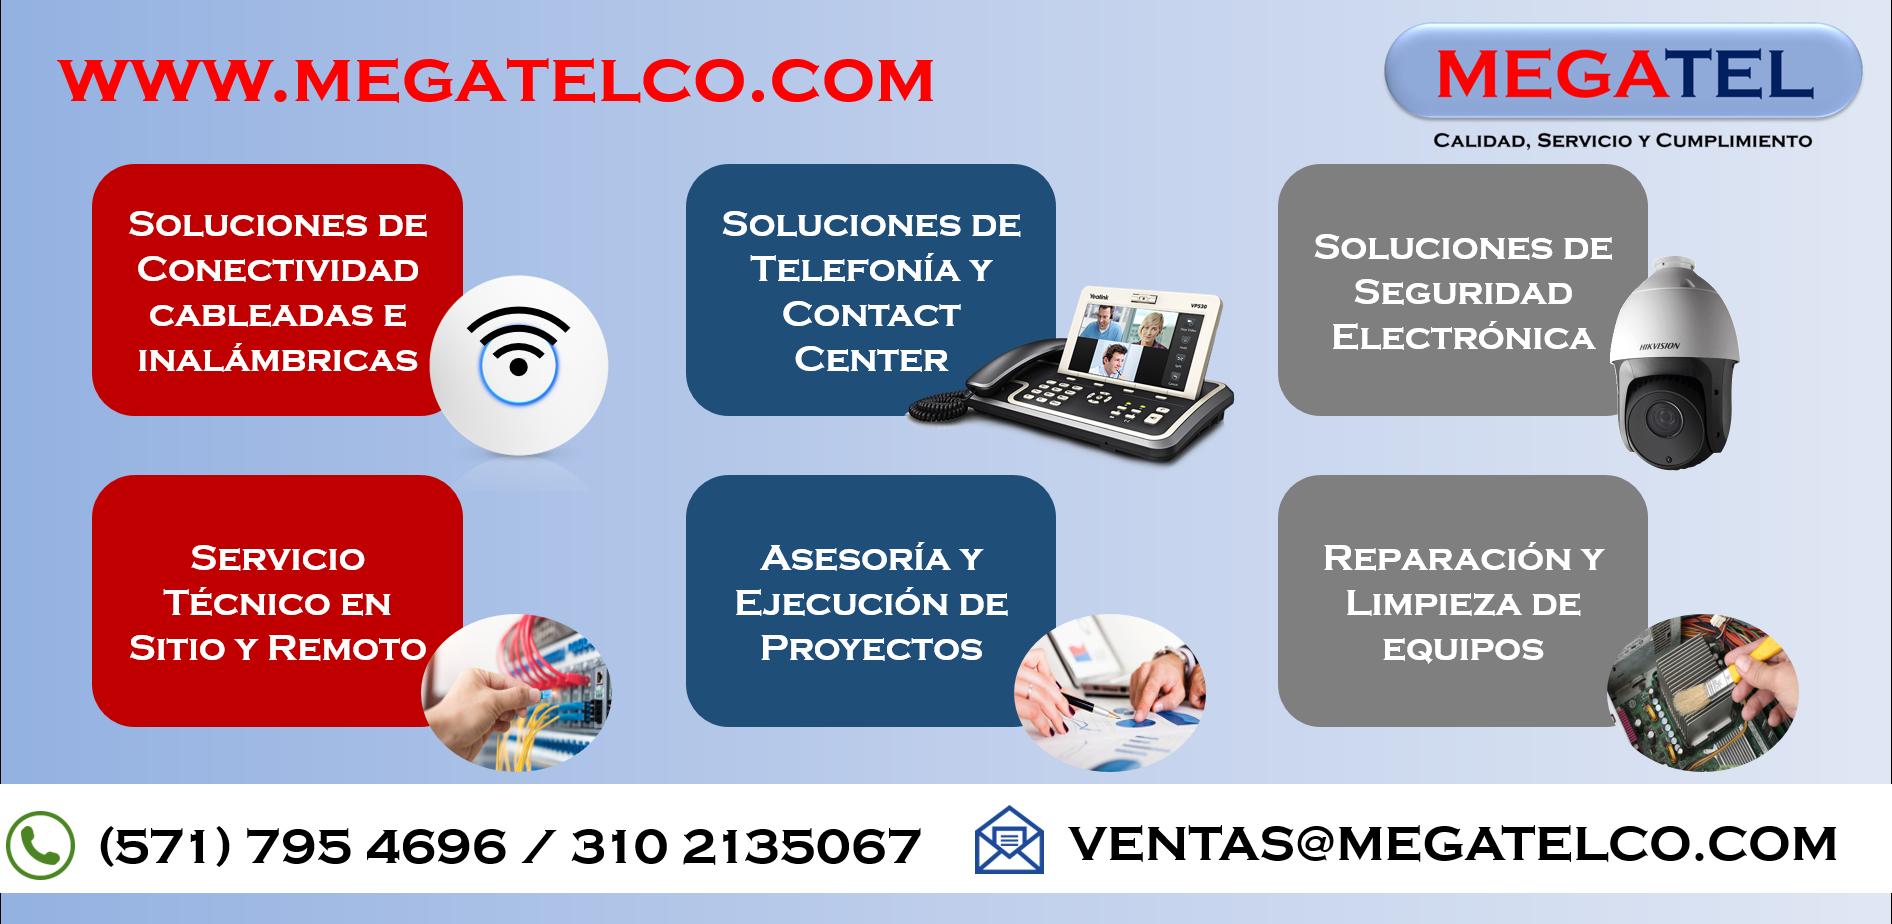 www.megatelco.com